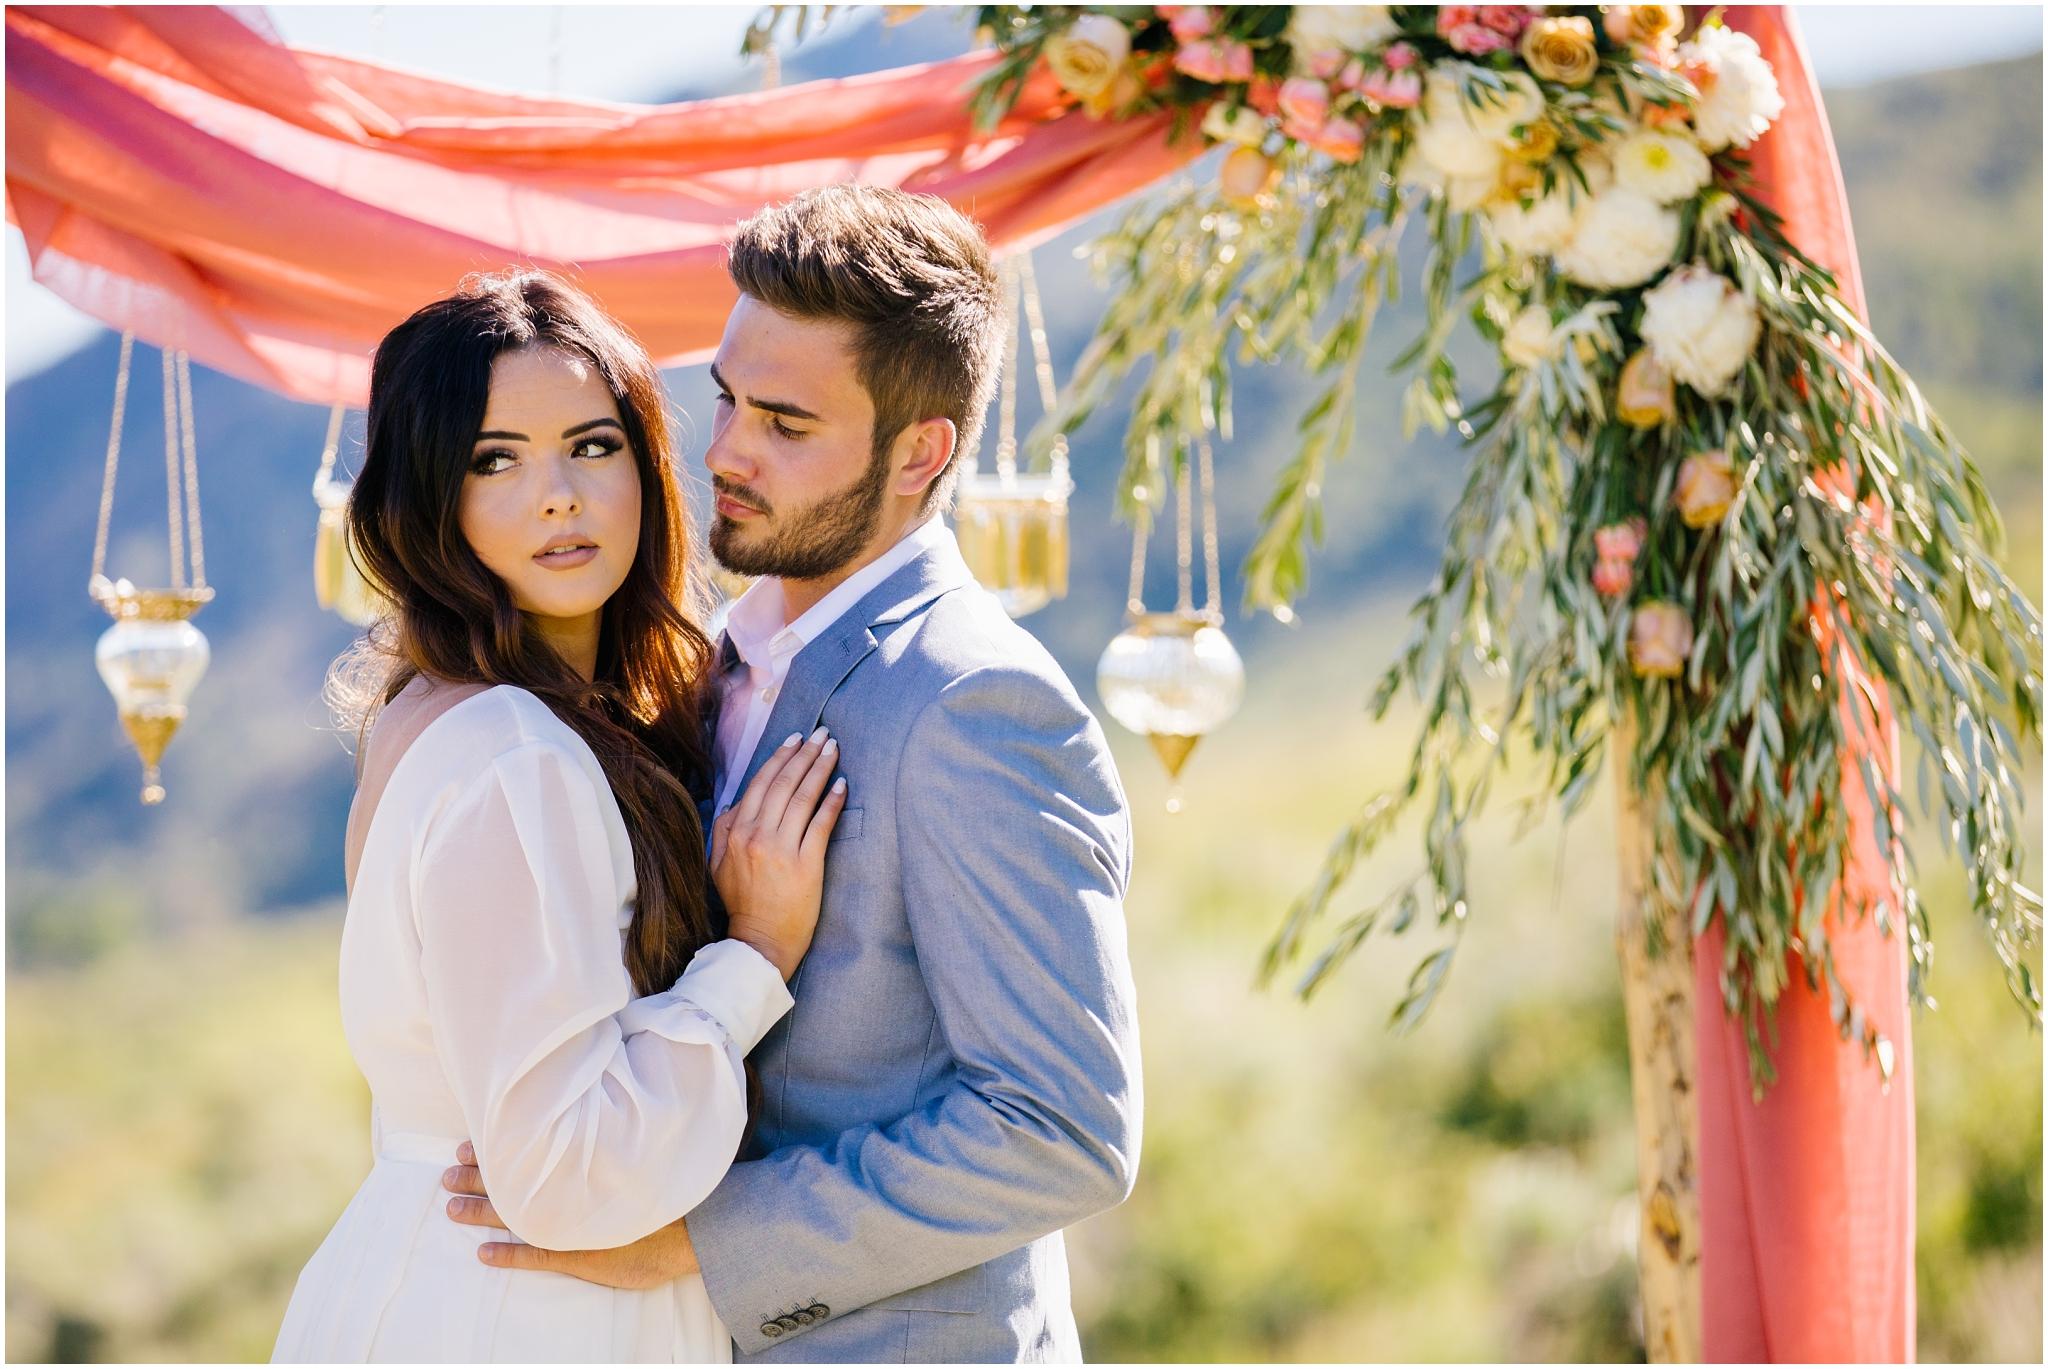 MountainShoot-6_Lizzie-B-Imagery-Utah-Wedding-Photographer-Salt-Lake-City-Park-City-Utah-County.jpg